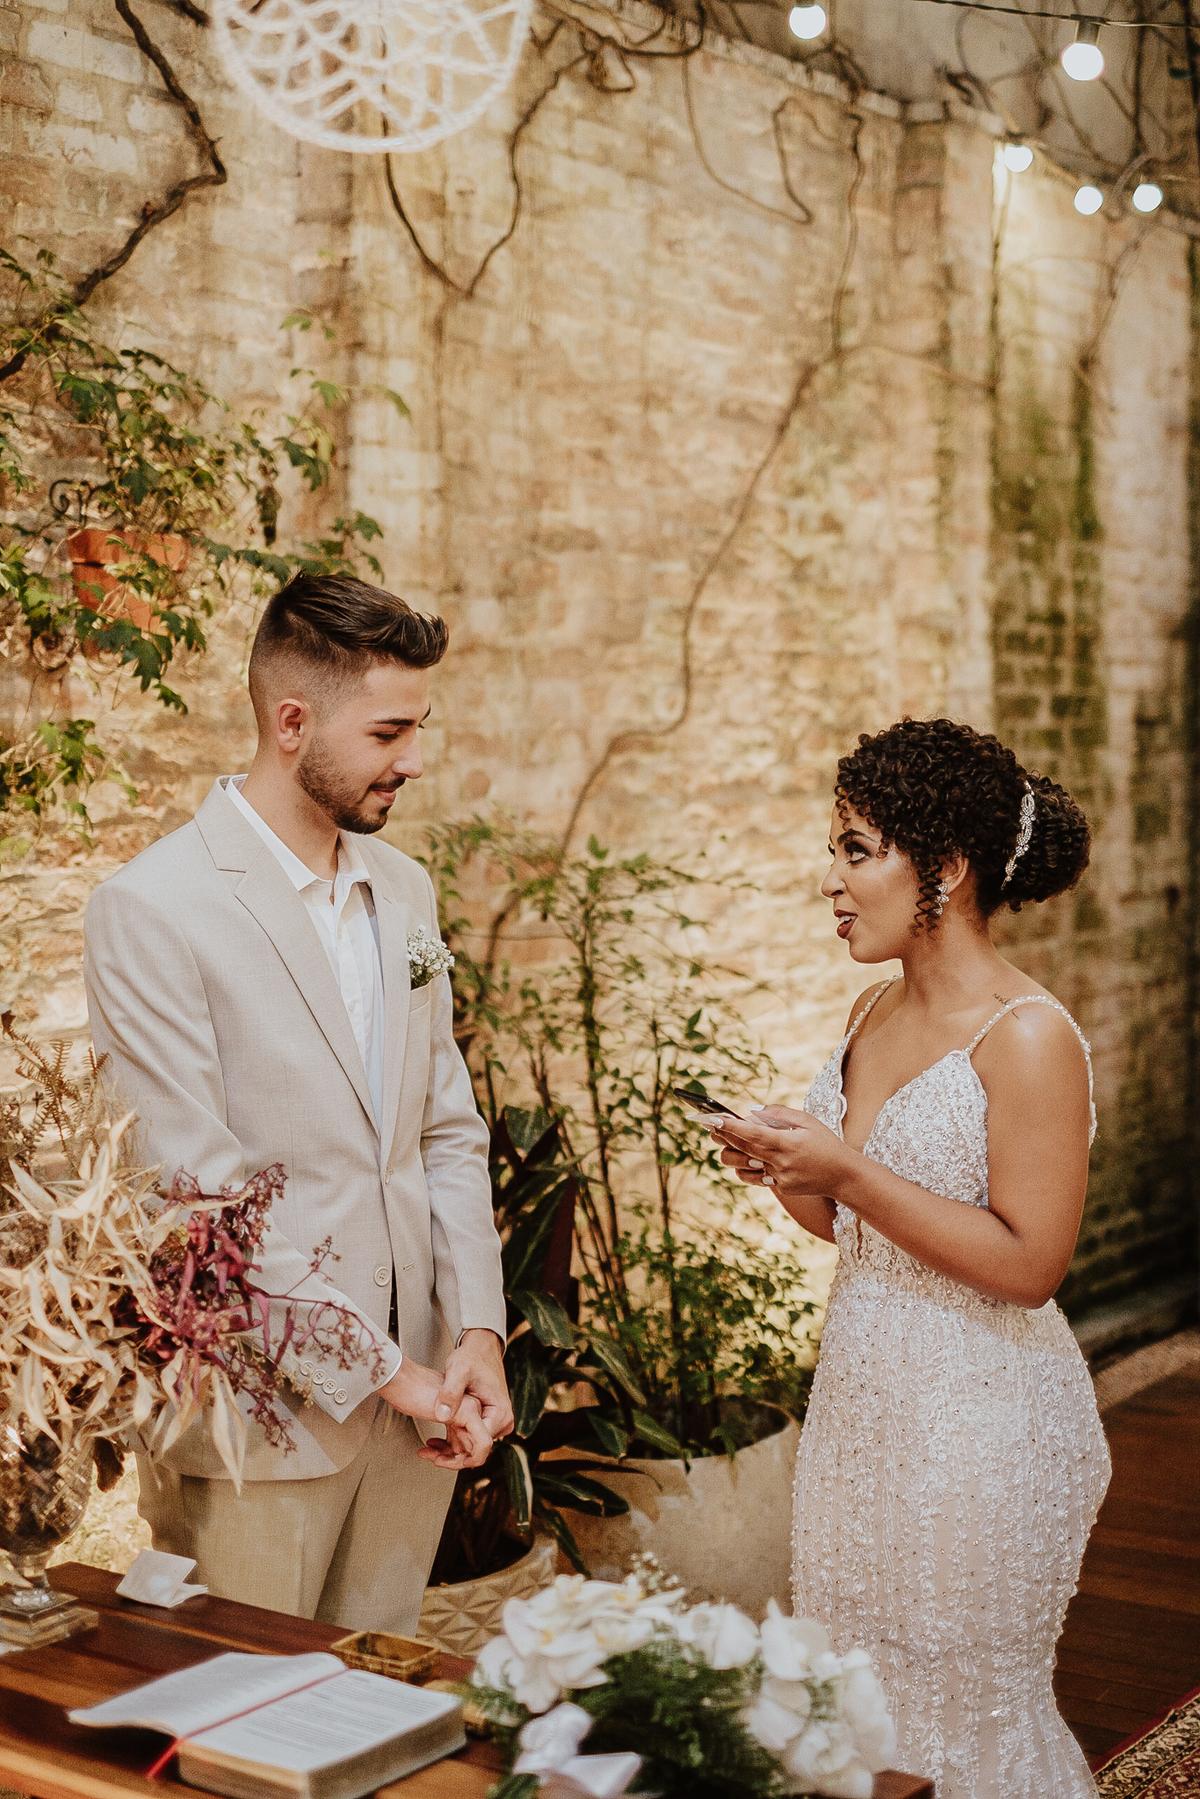 casamentos intimistas elopement wedding noivos no altar ideias para casar decoracao de casamento cerimonias intimistas votos da noiva